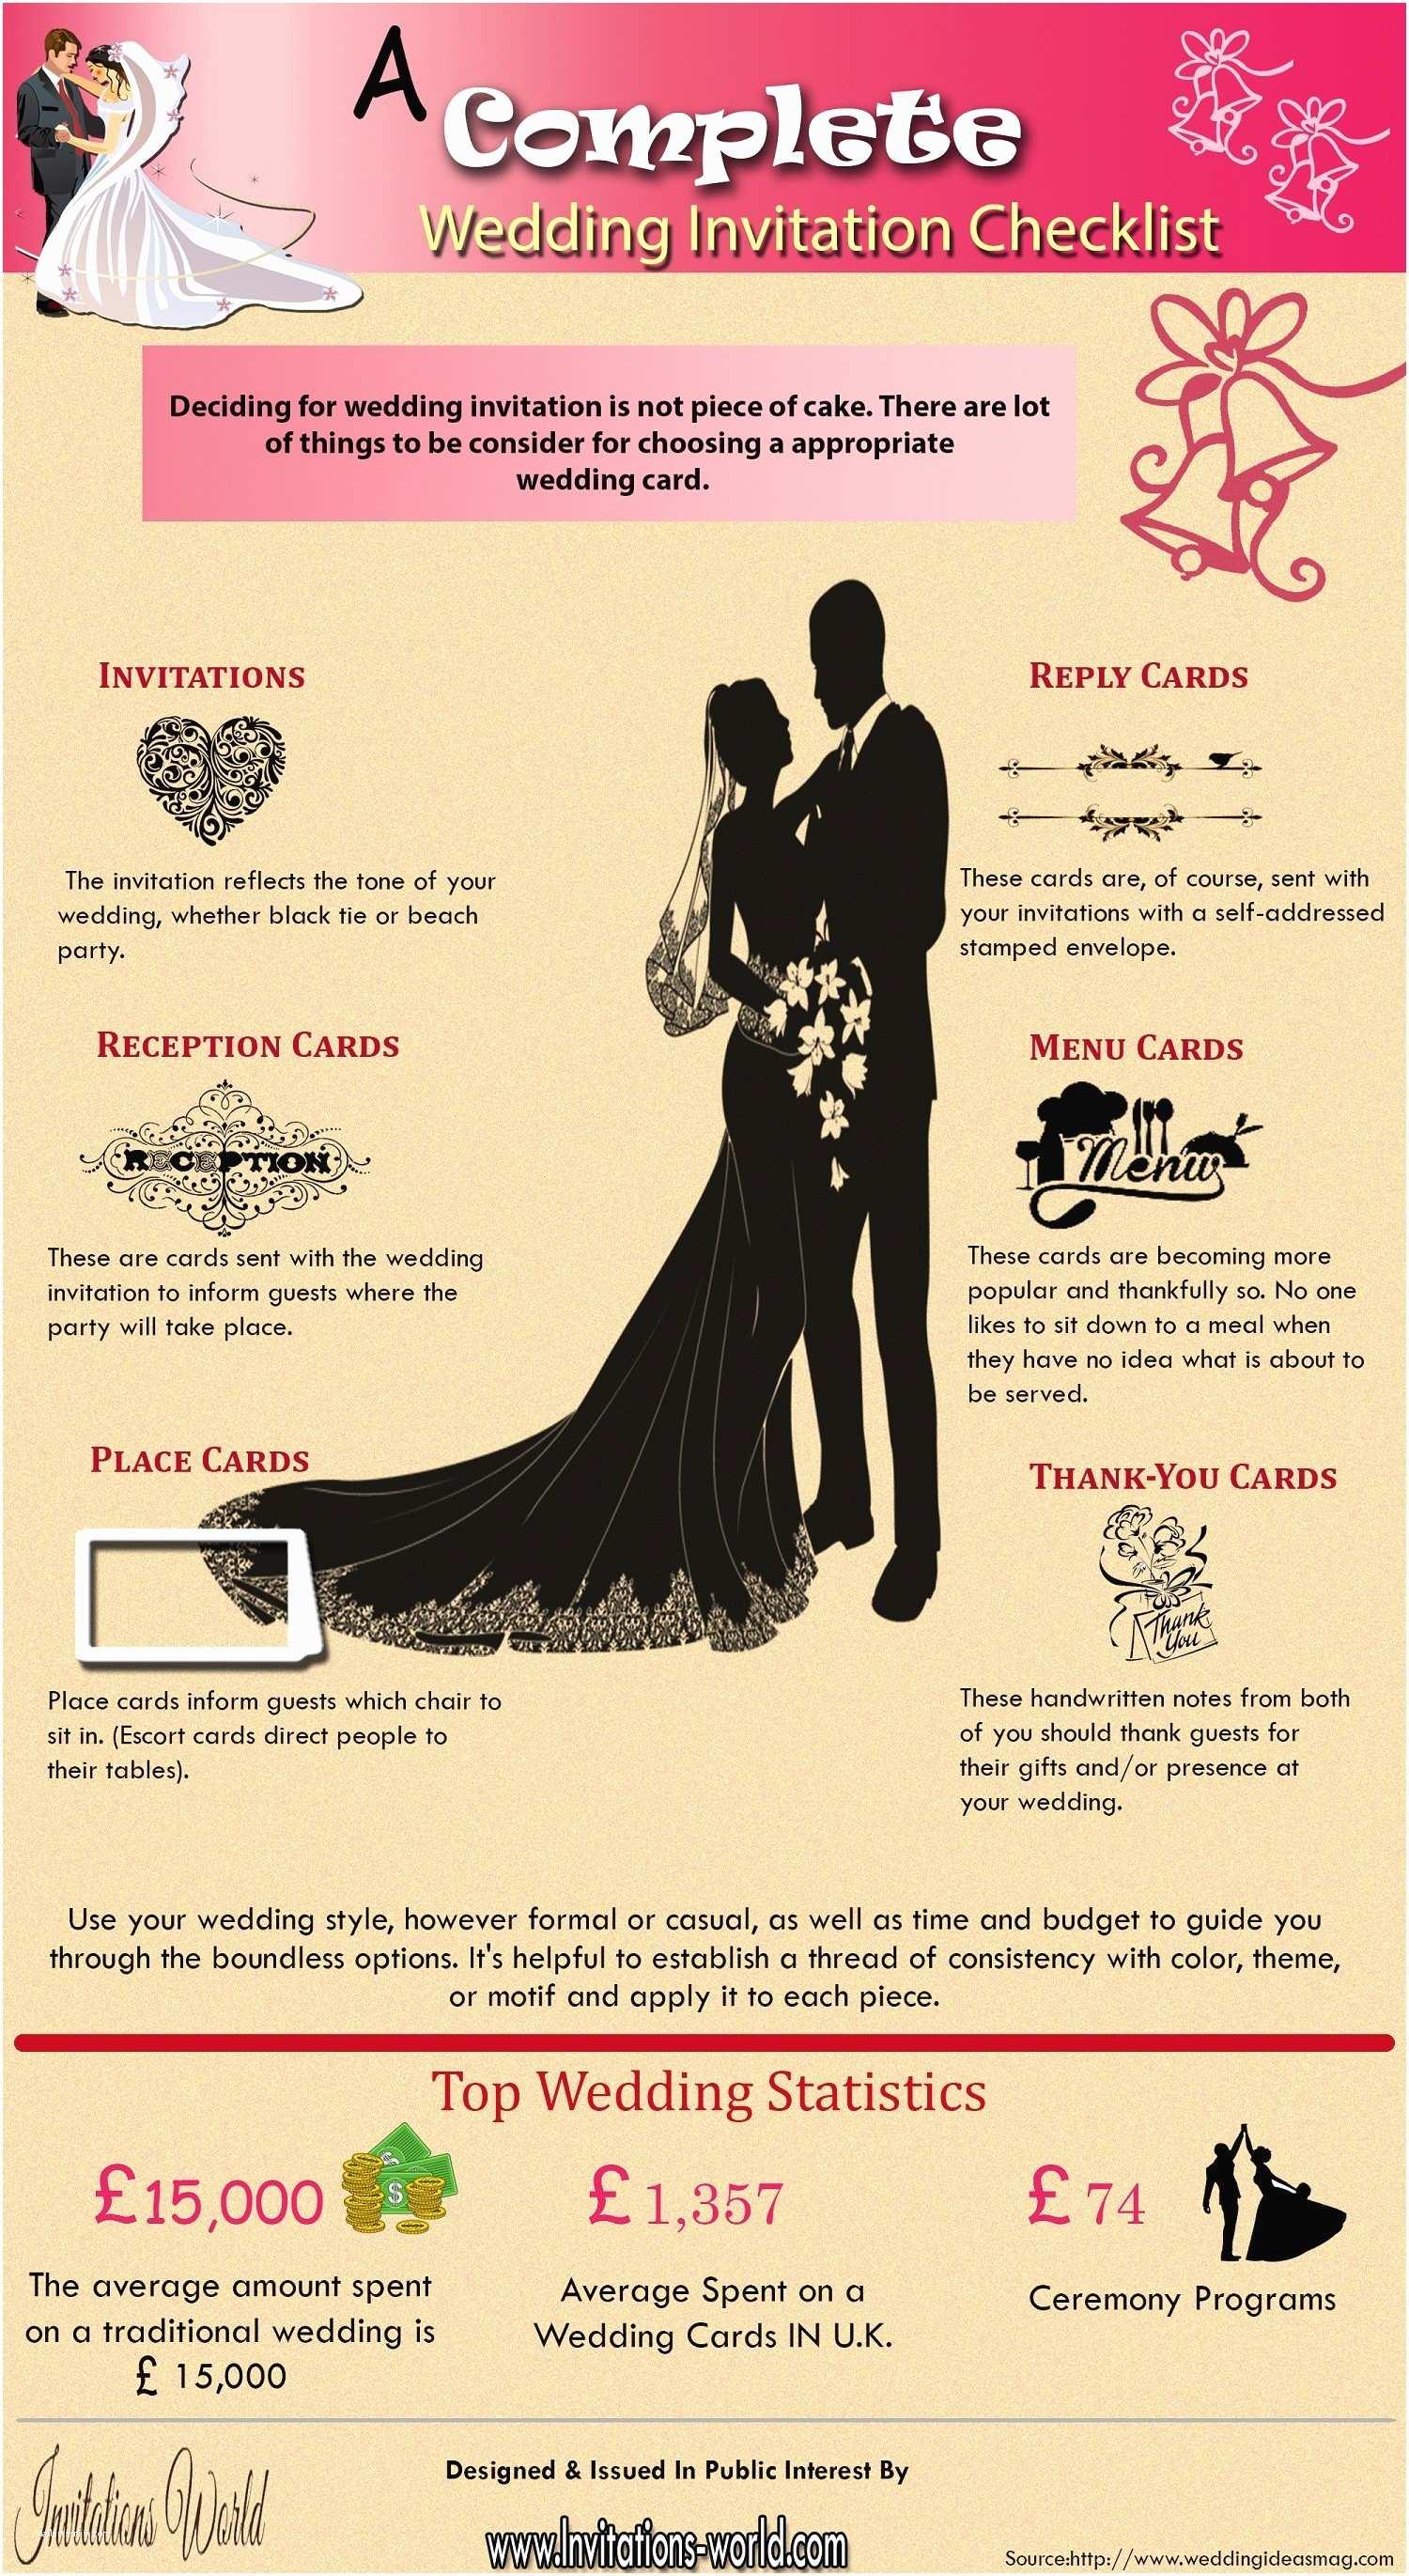 Wedding Invitation Checklist A Plete Wedding Invitation Checklist